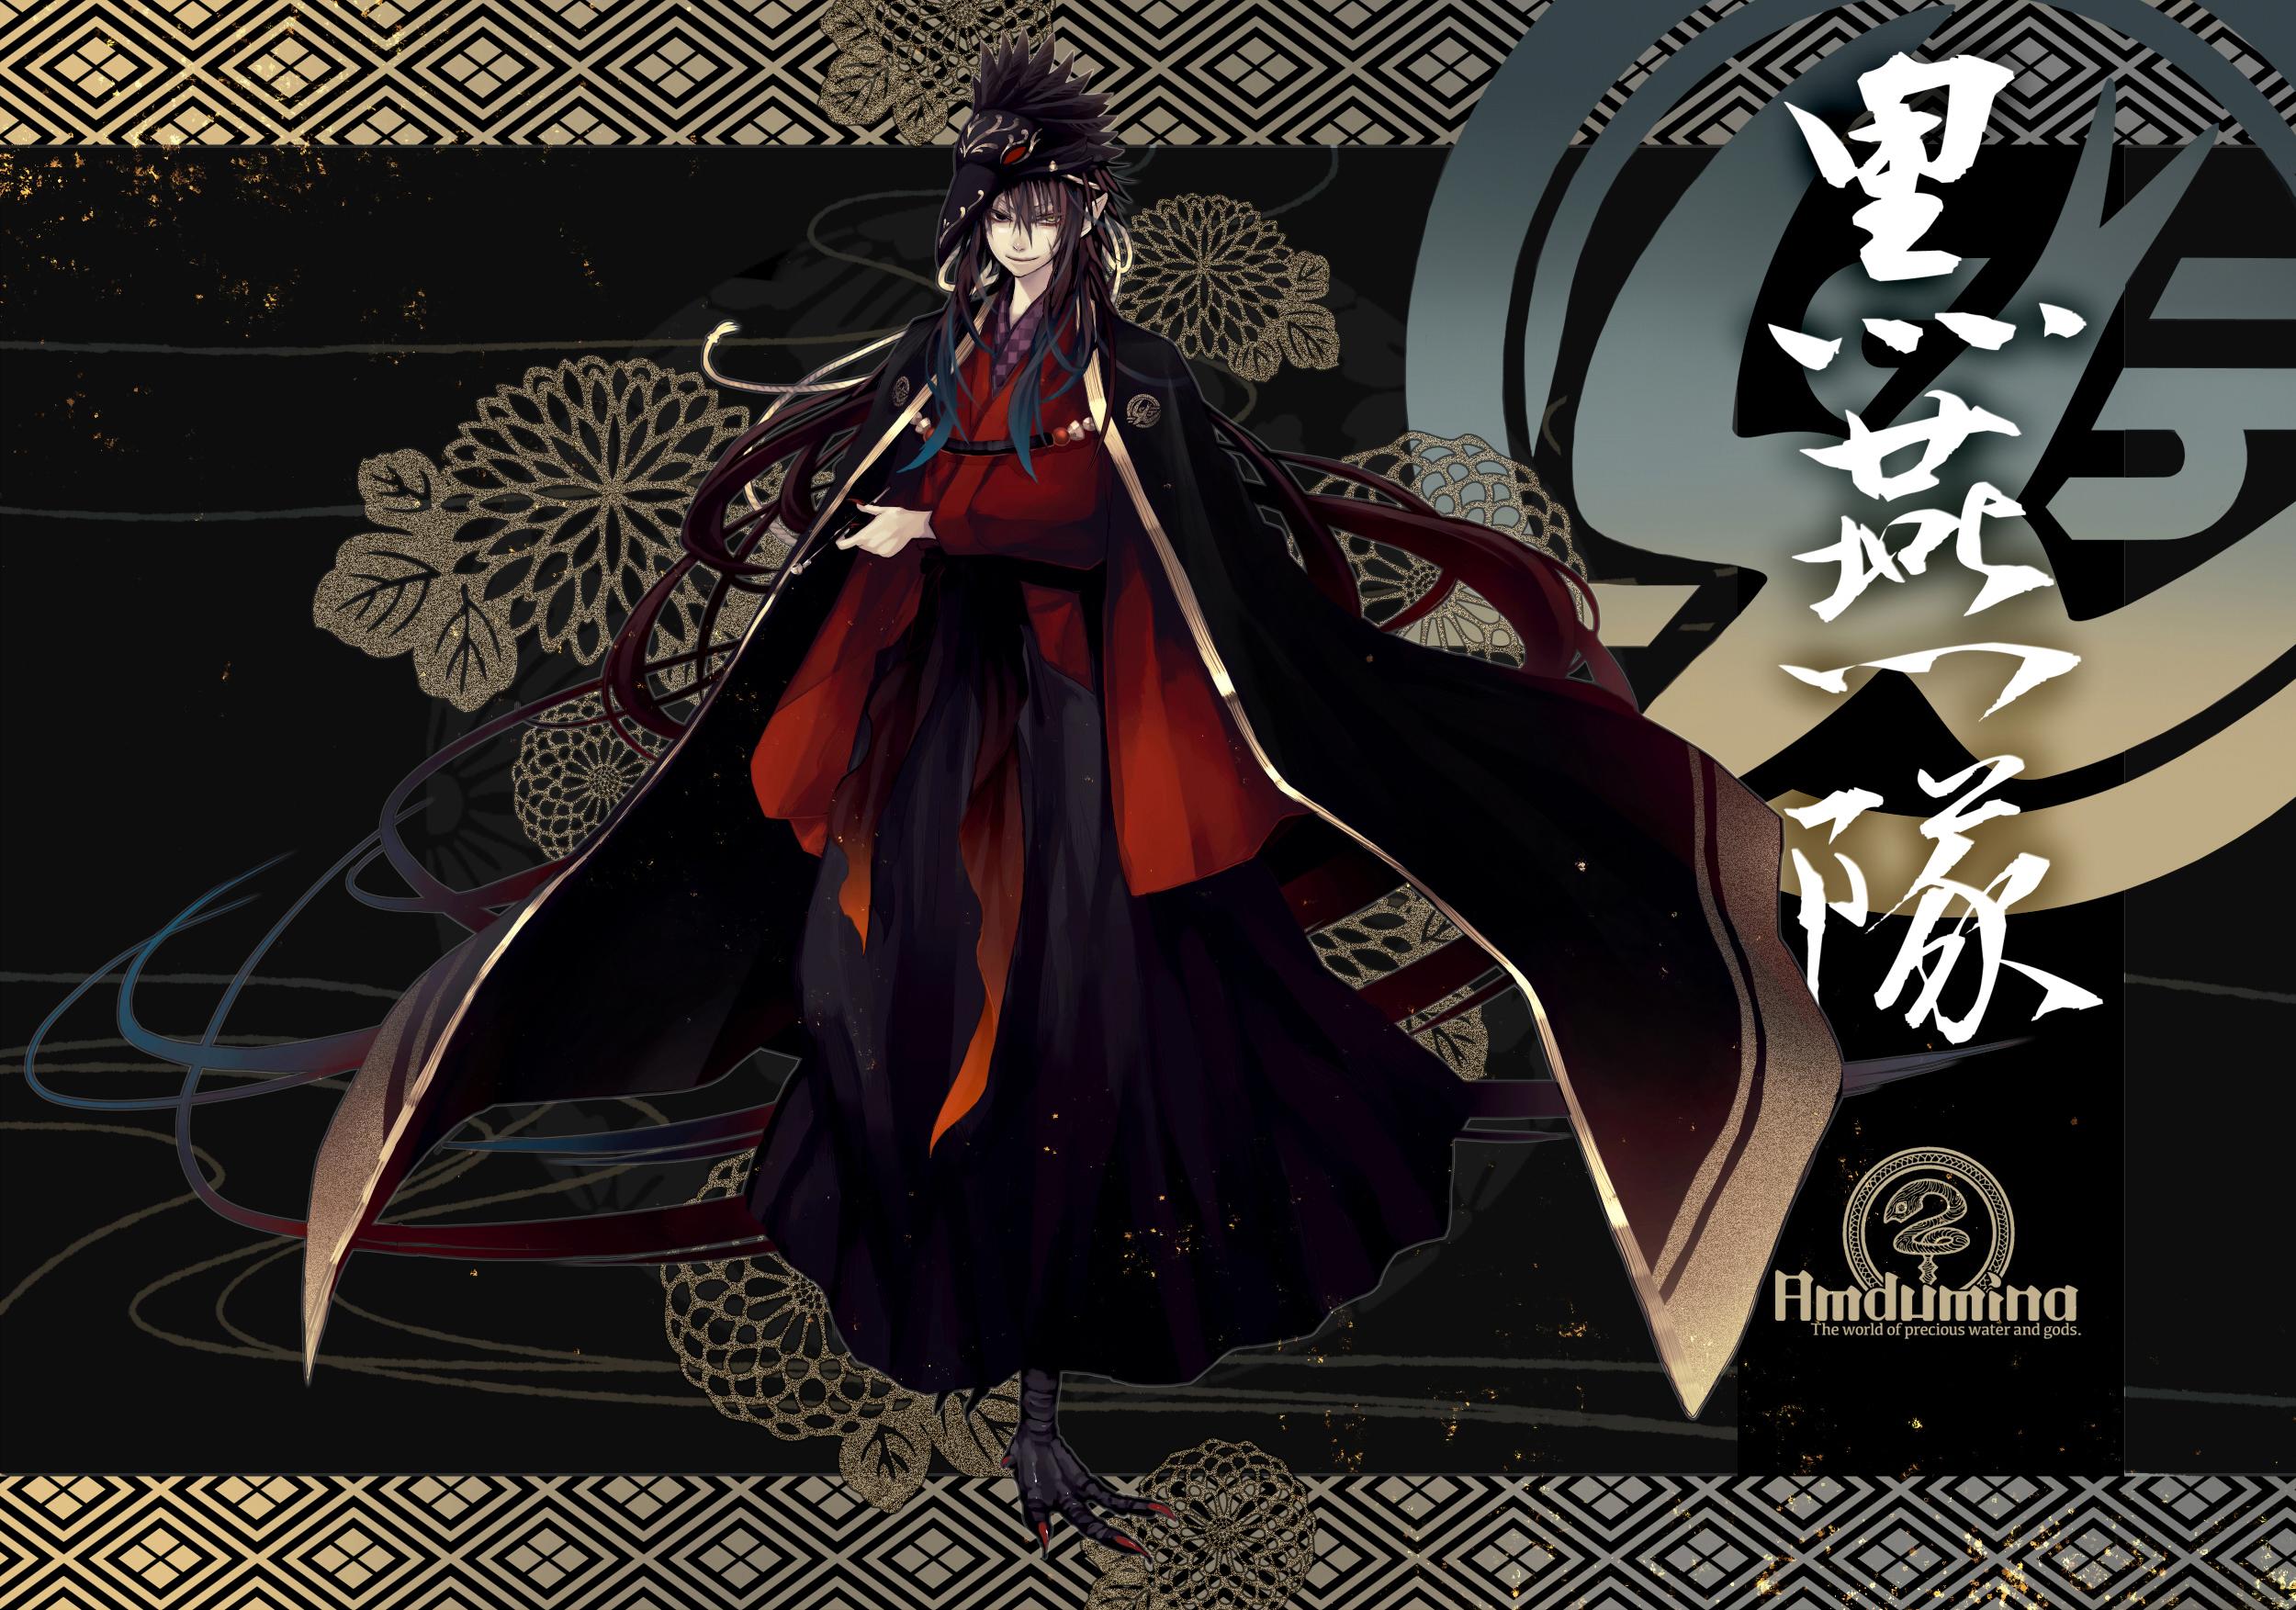 Tags: Original, Pixiv, Azuma Yuuki (Pixiv120419), Pixiv Fantasia: New World